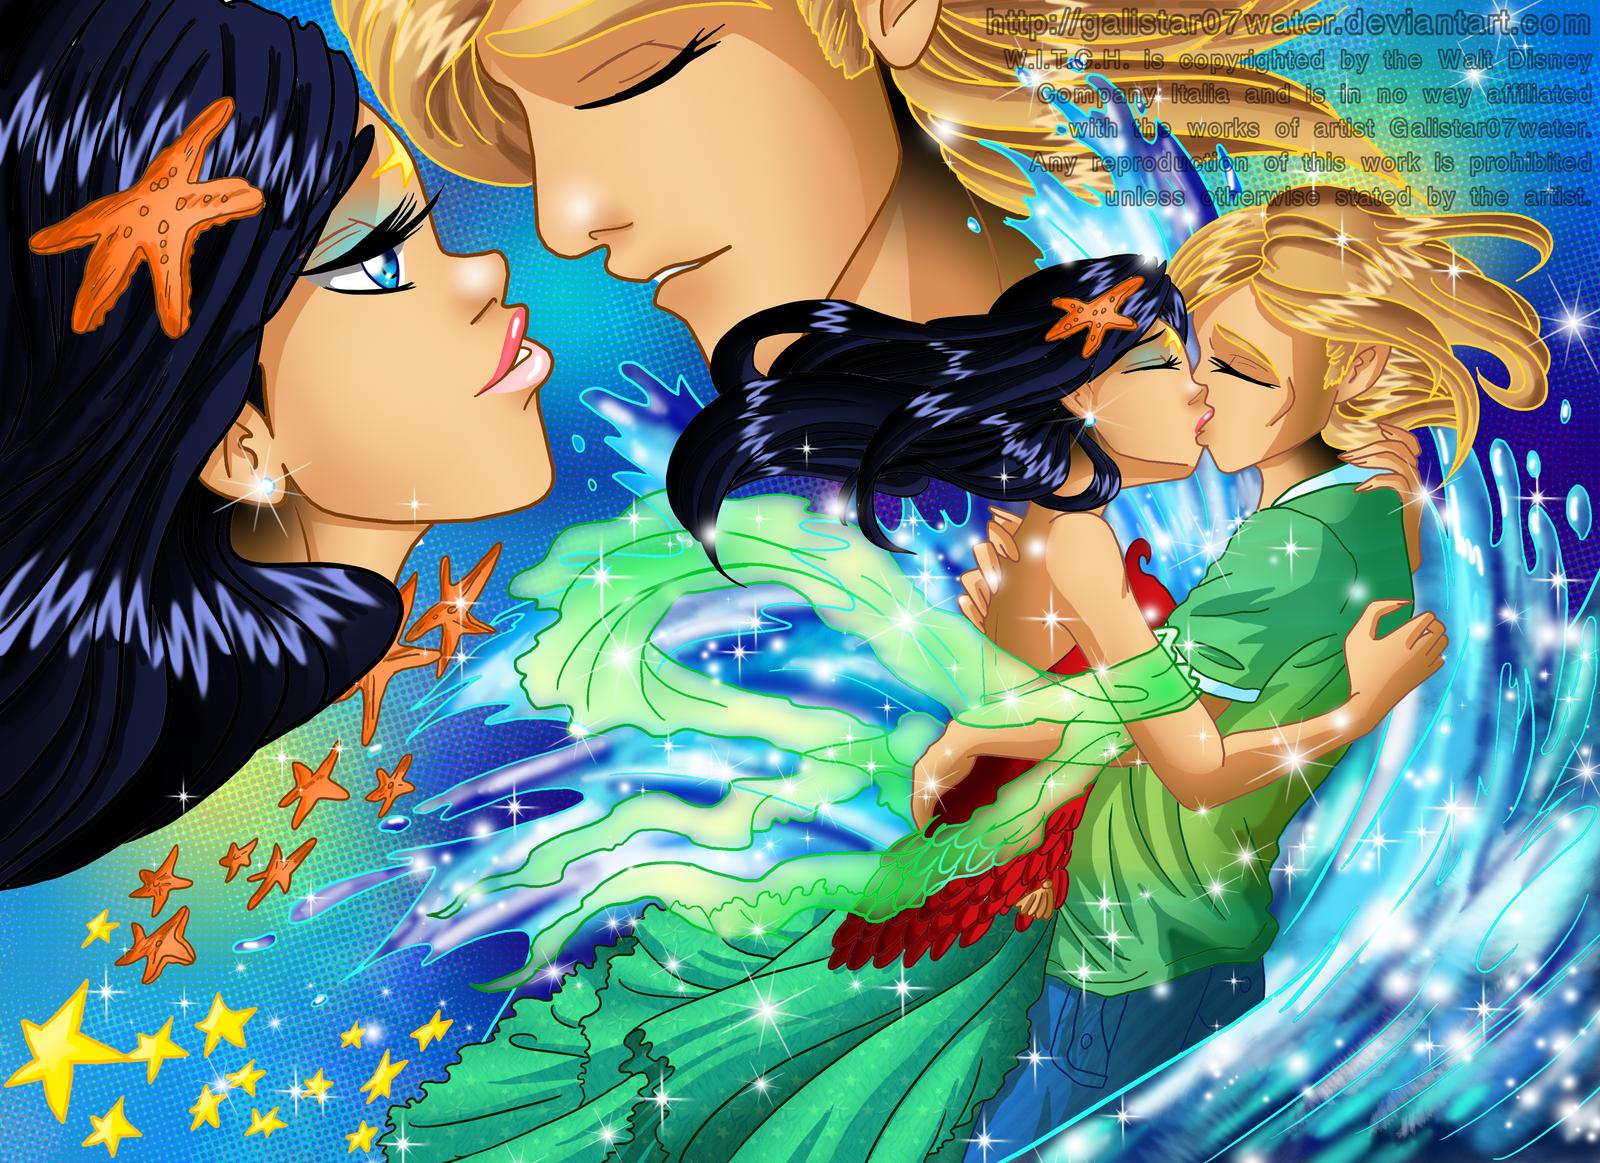 The Eternal Kiss by Galistar07water